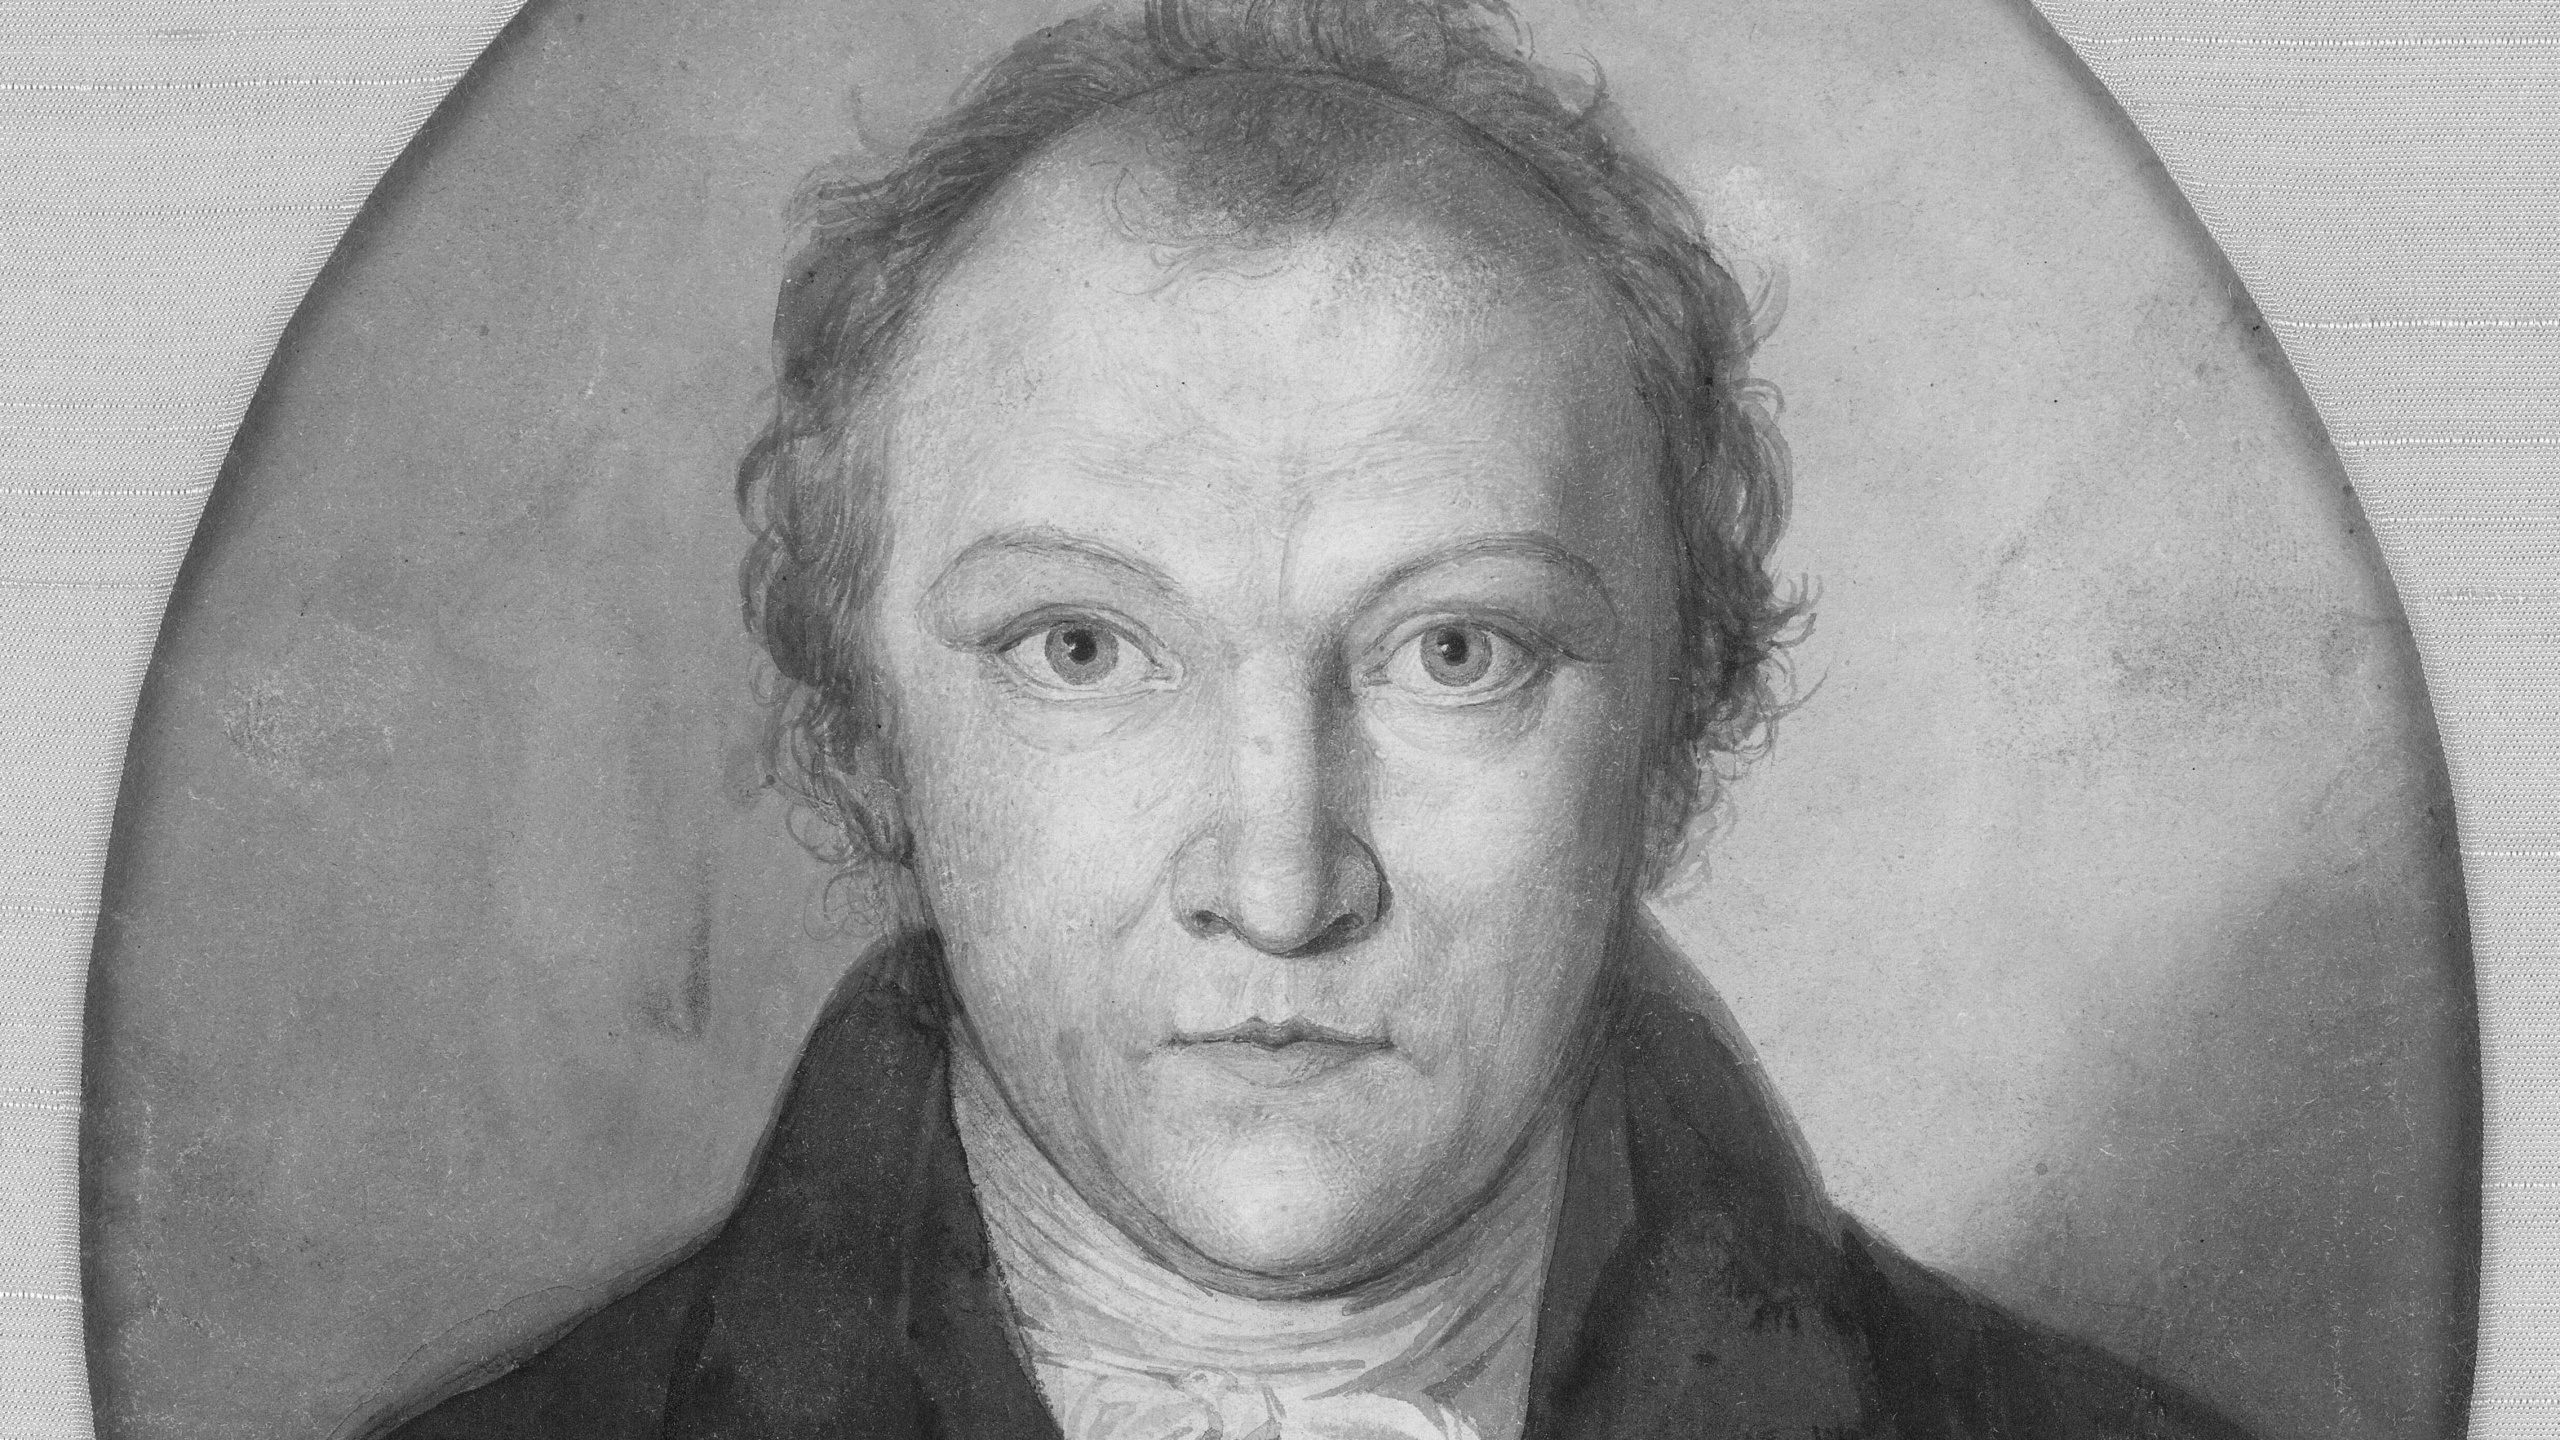 William Blake, self portrait of the artist